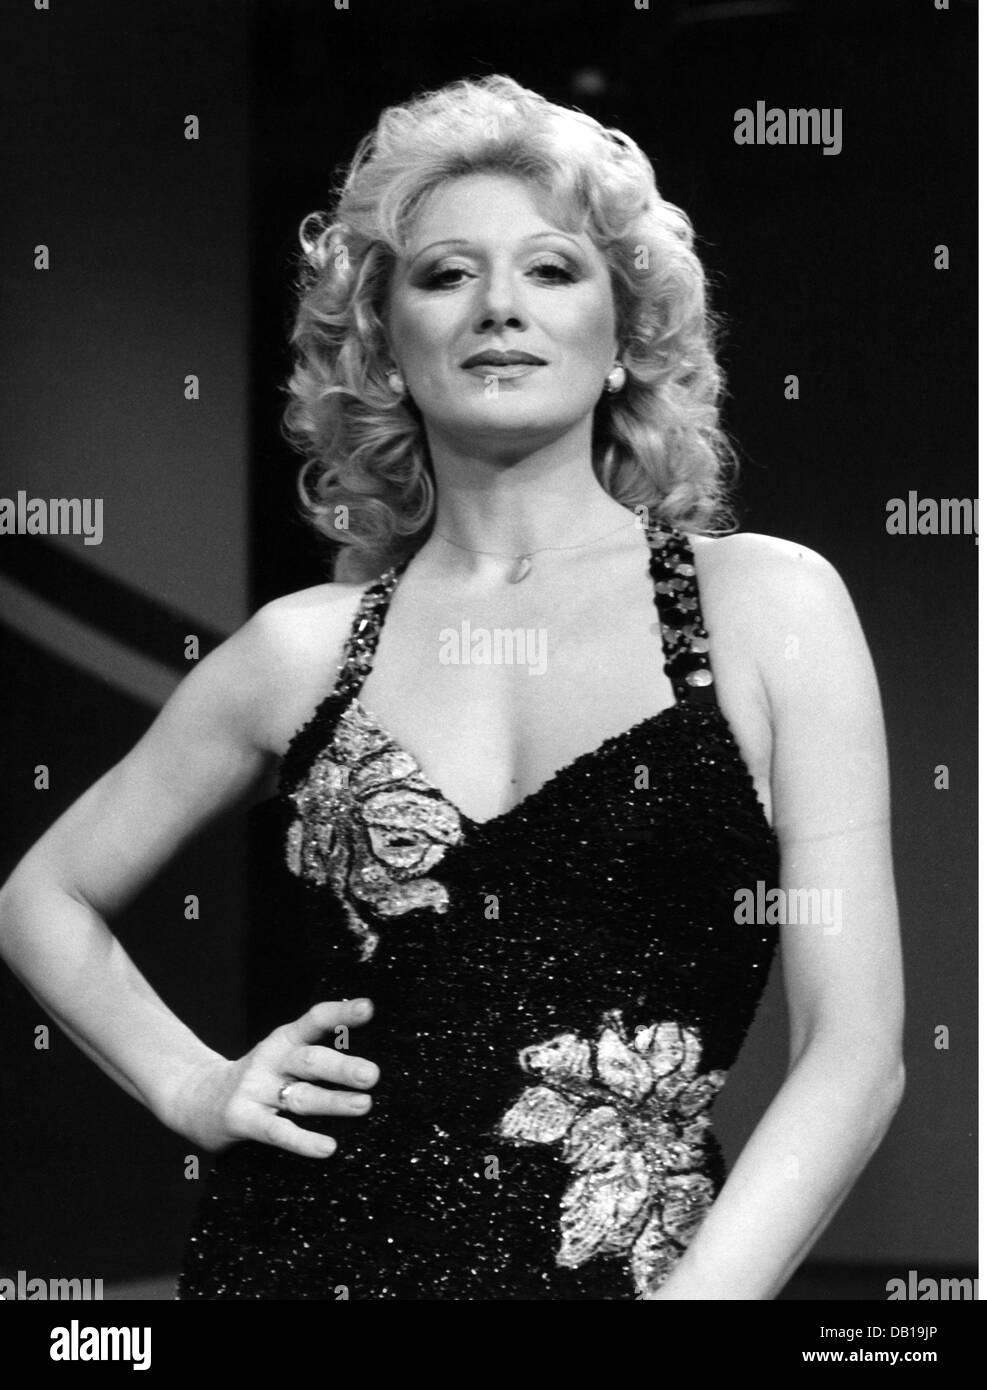 Werner, Margot, 8.12.1937 - 1.7.2012, Austrian dancer and singer, half length, at the ARD television show 'Die - Stock Image